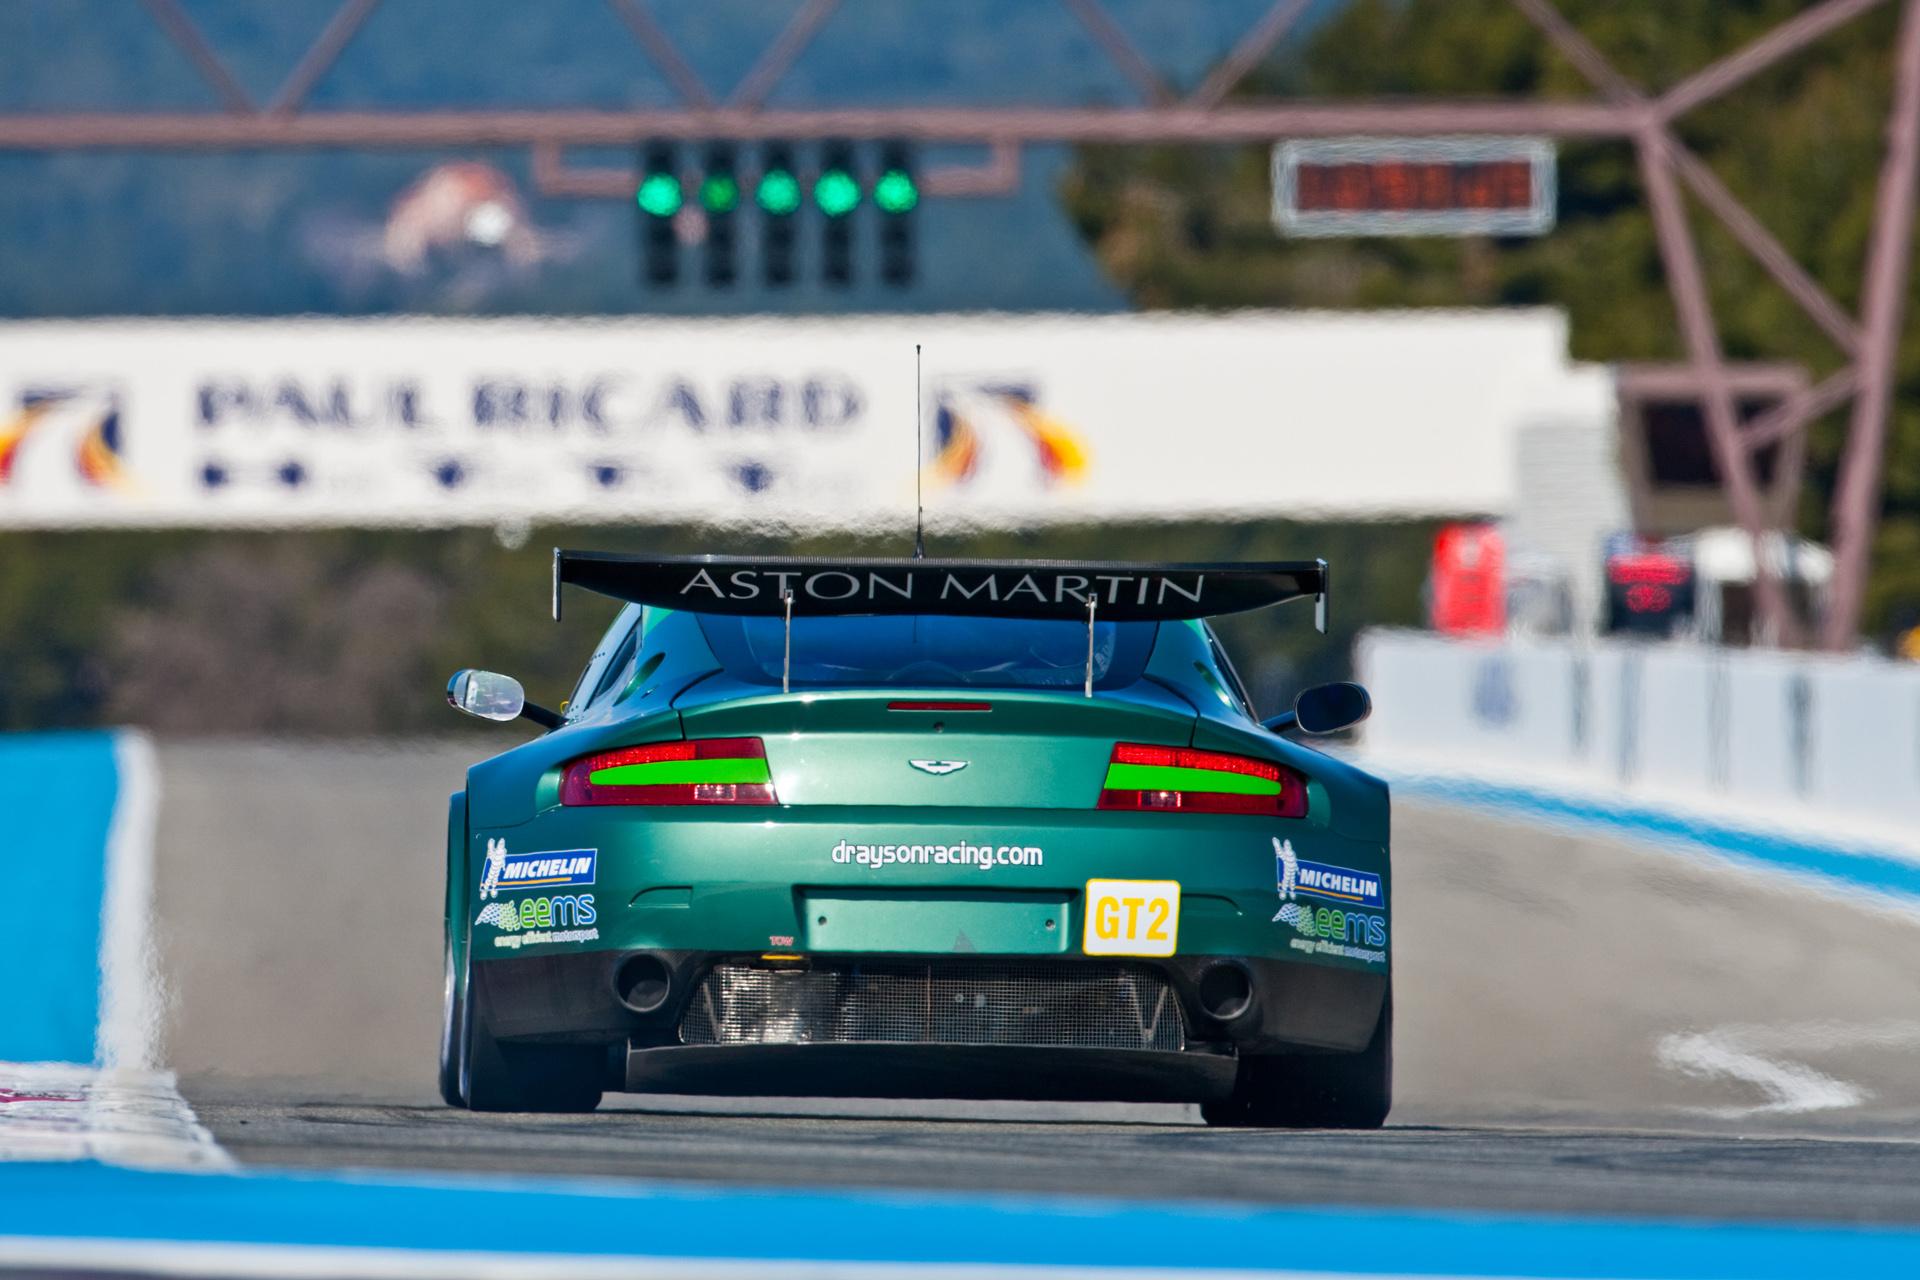 Aston Martin Vantage GT2 High Quality Background on Wallpapers Vista